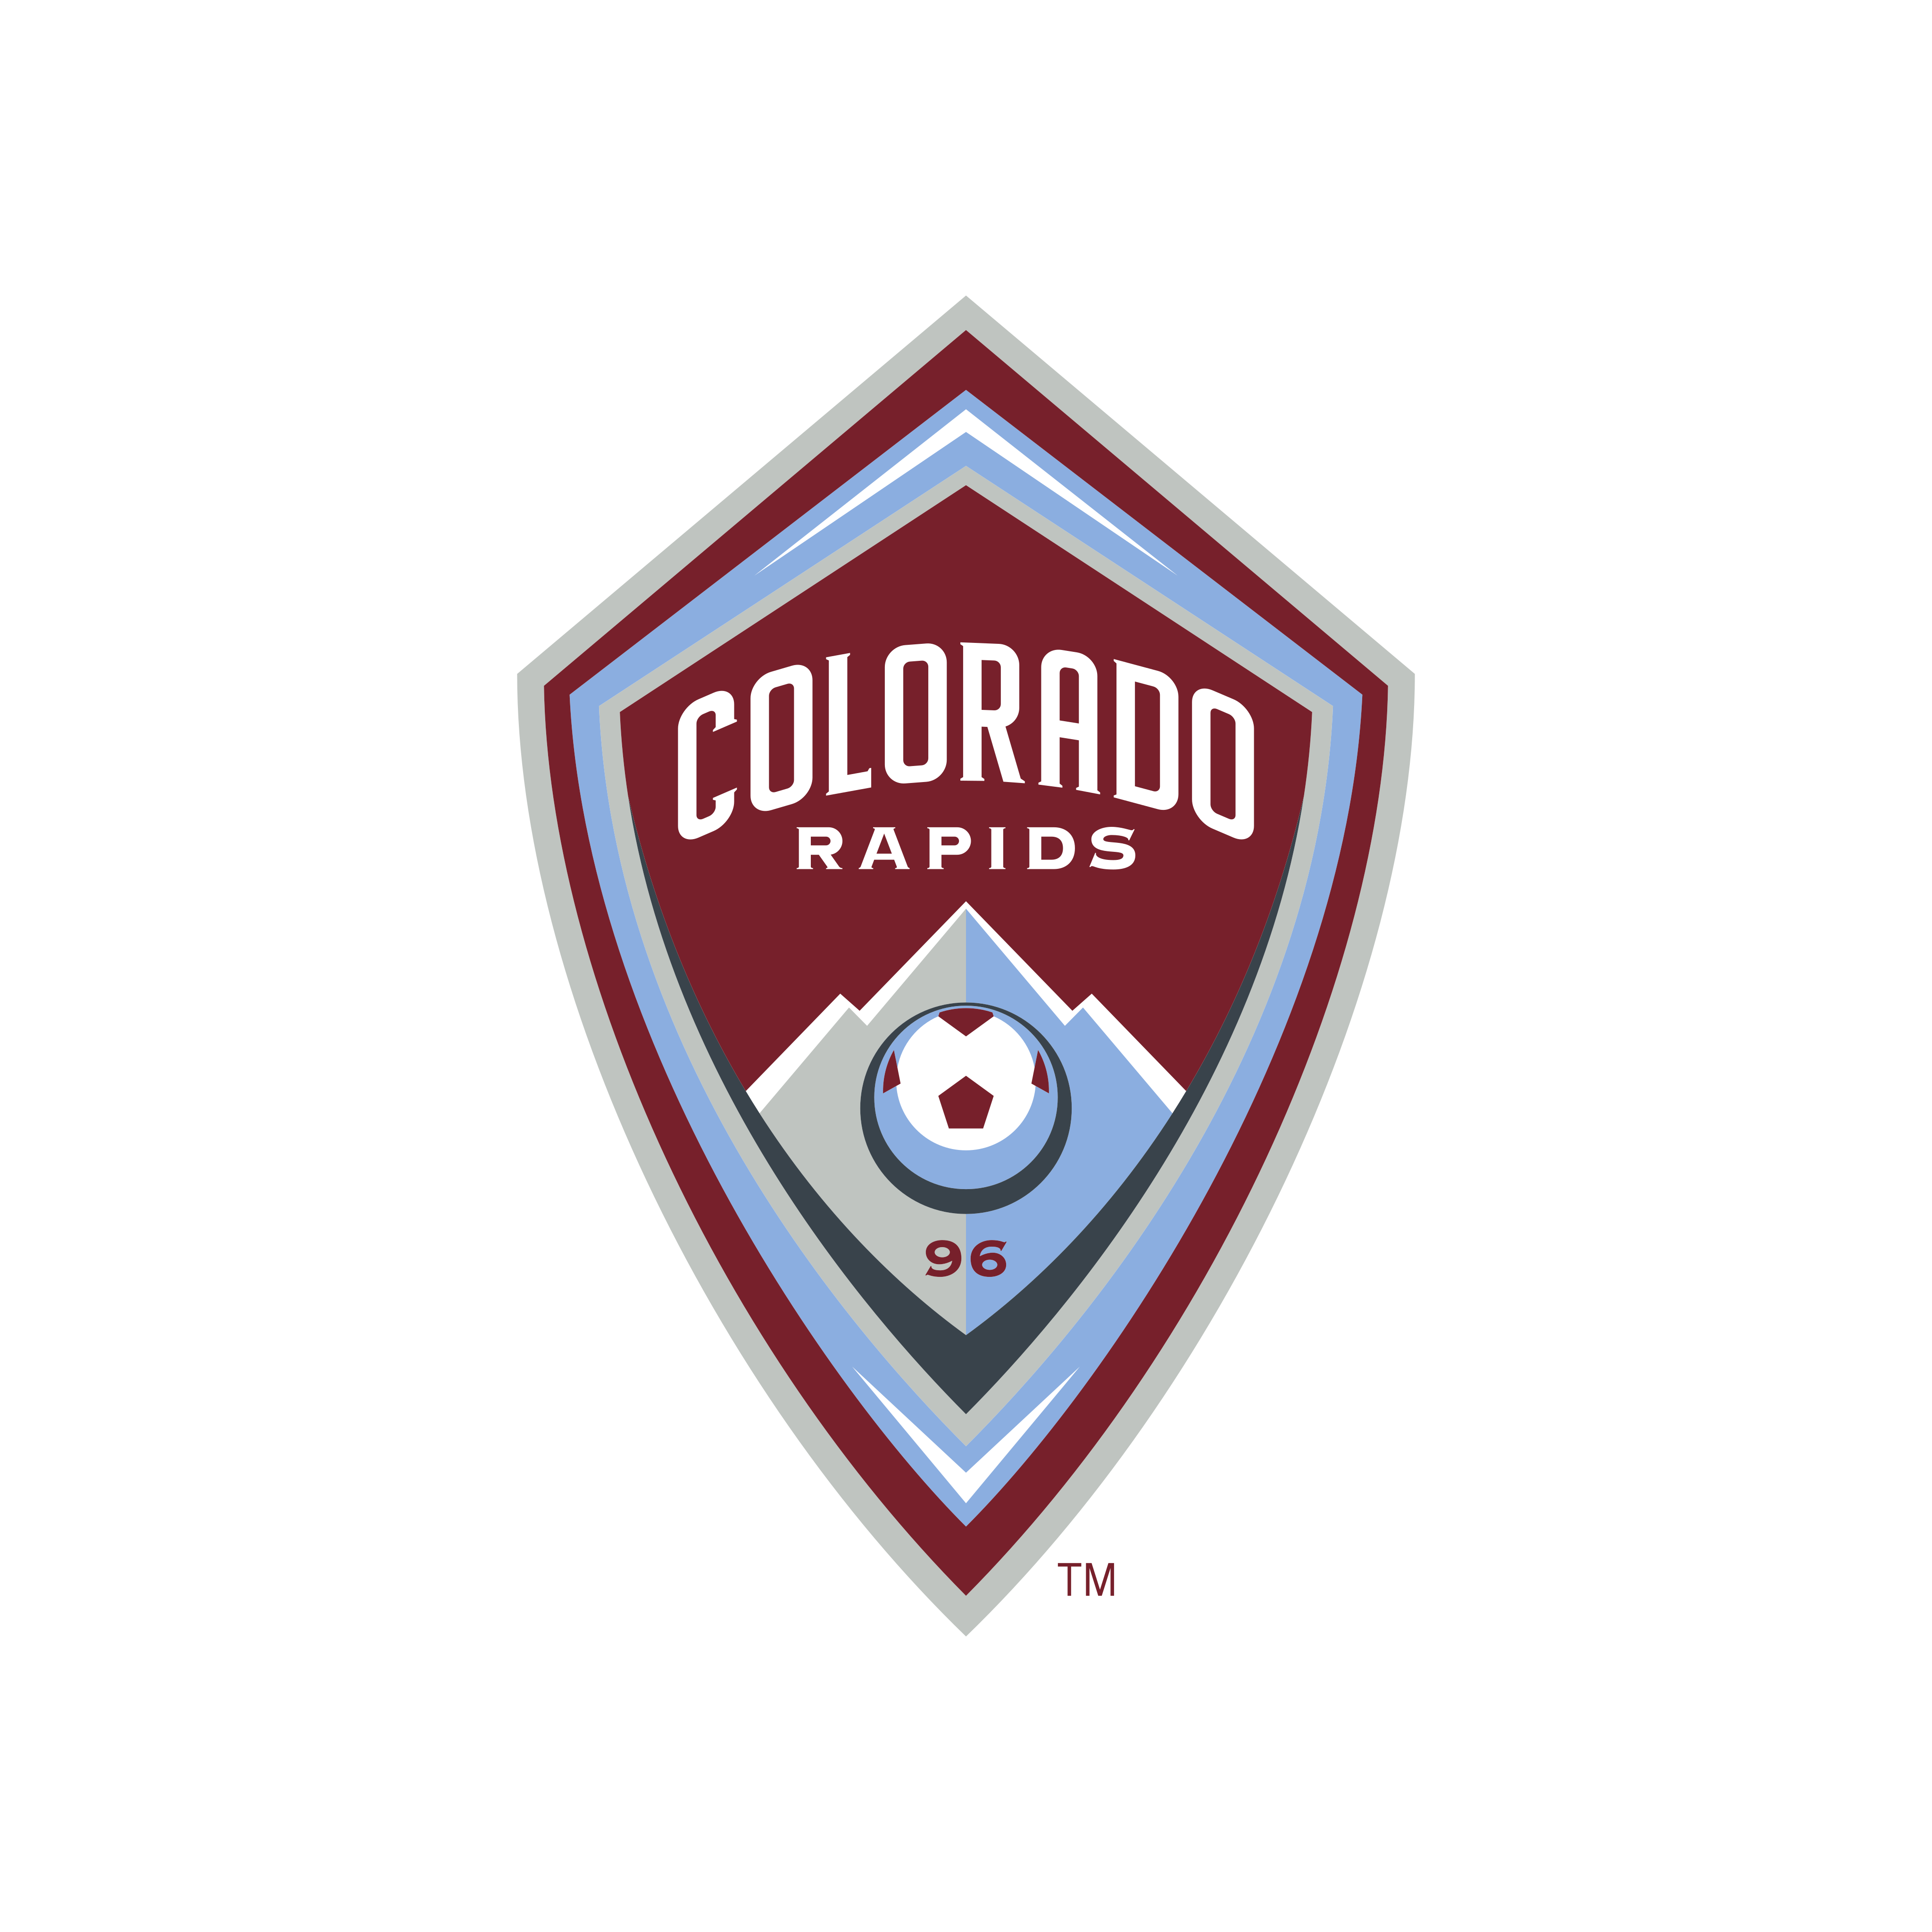 colorado rapids logo 0 - Colorado Rapids Logo